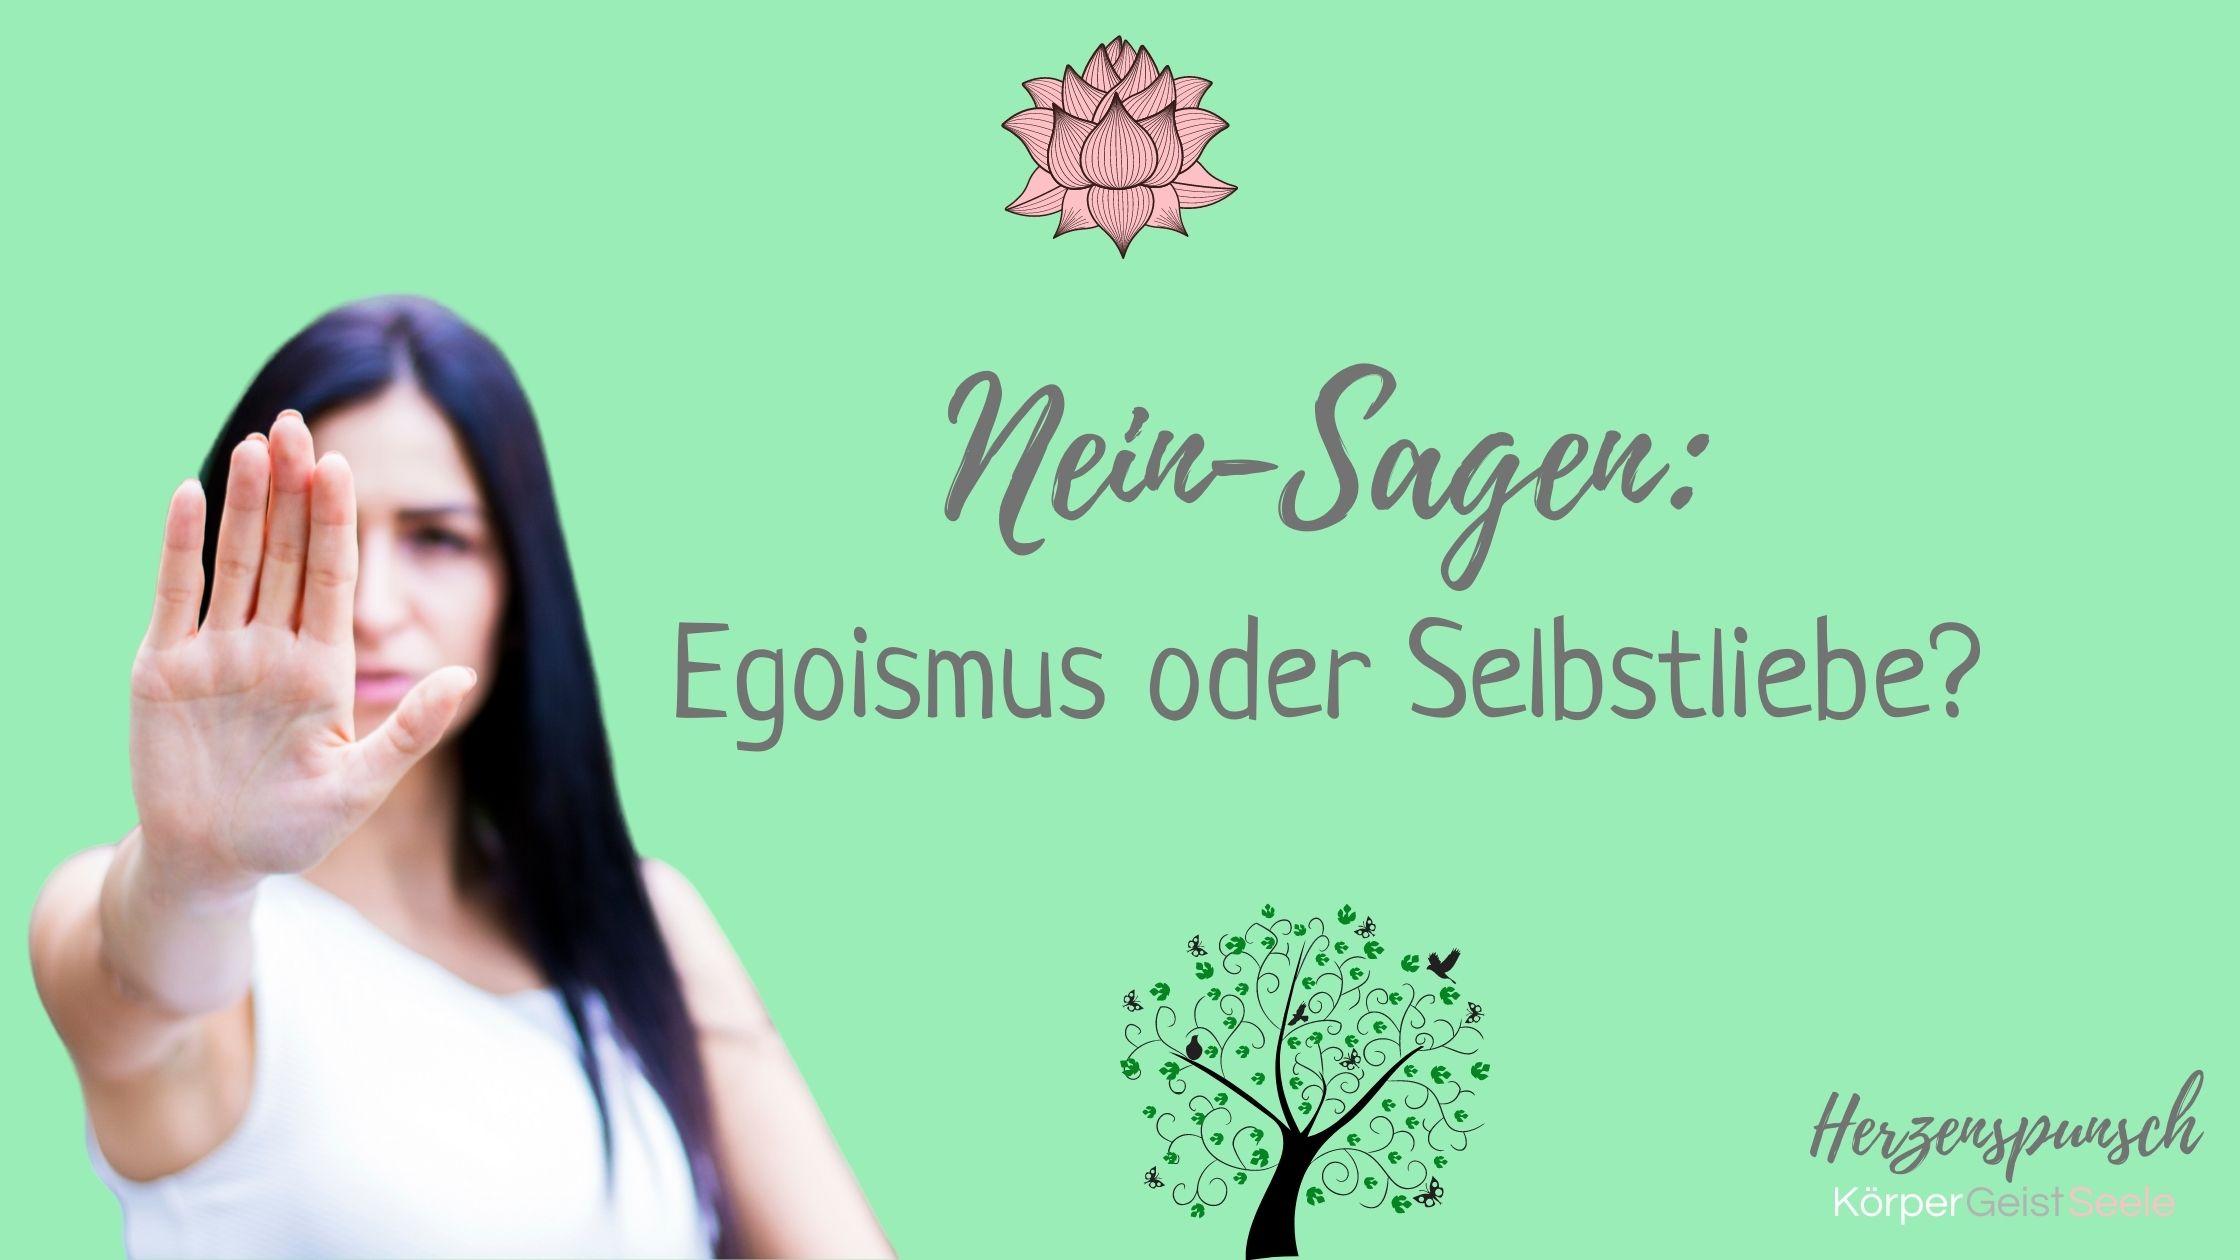 You are currently viewing Nein-Sagen: Egoismus oder Selbstliebe